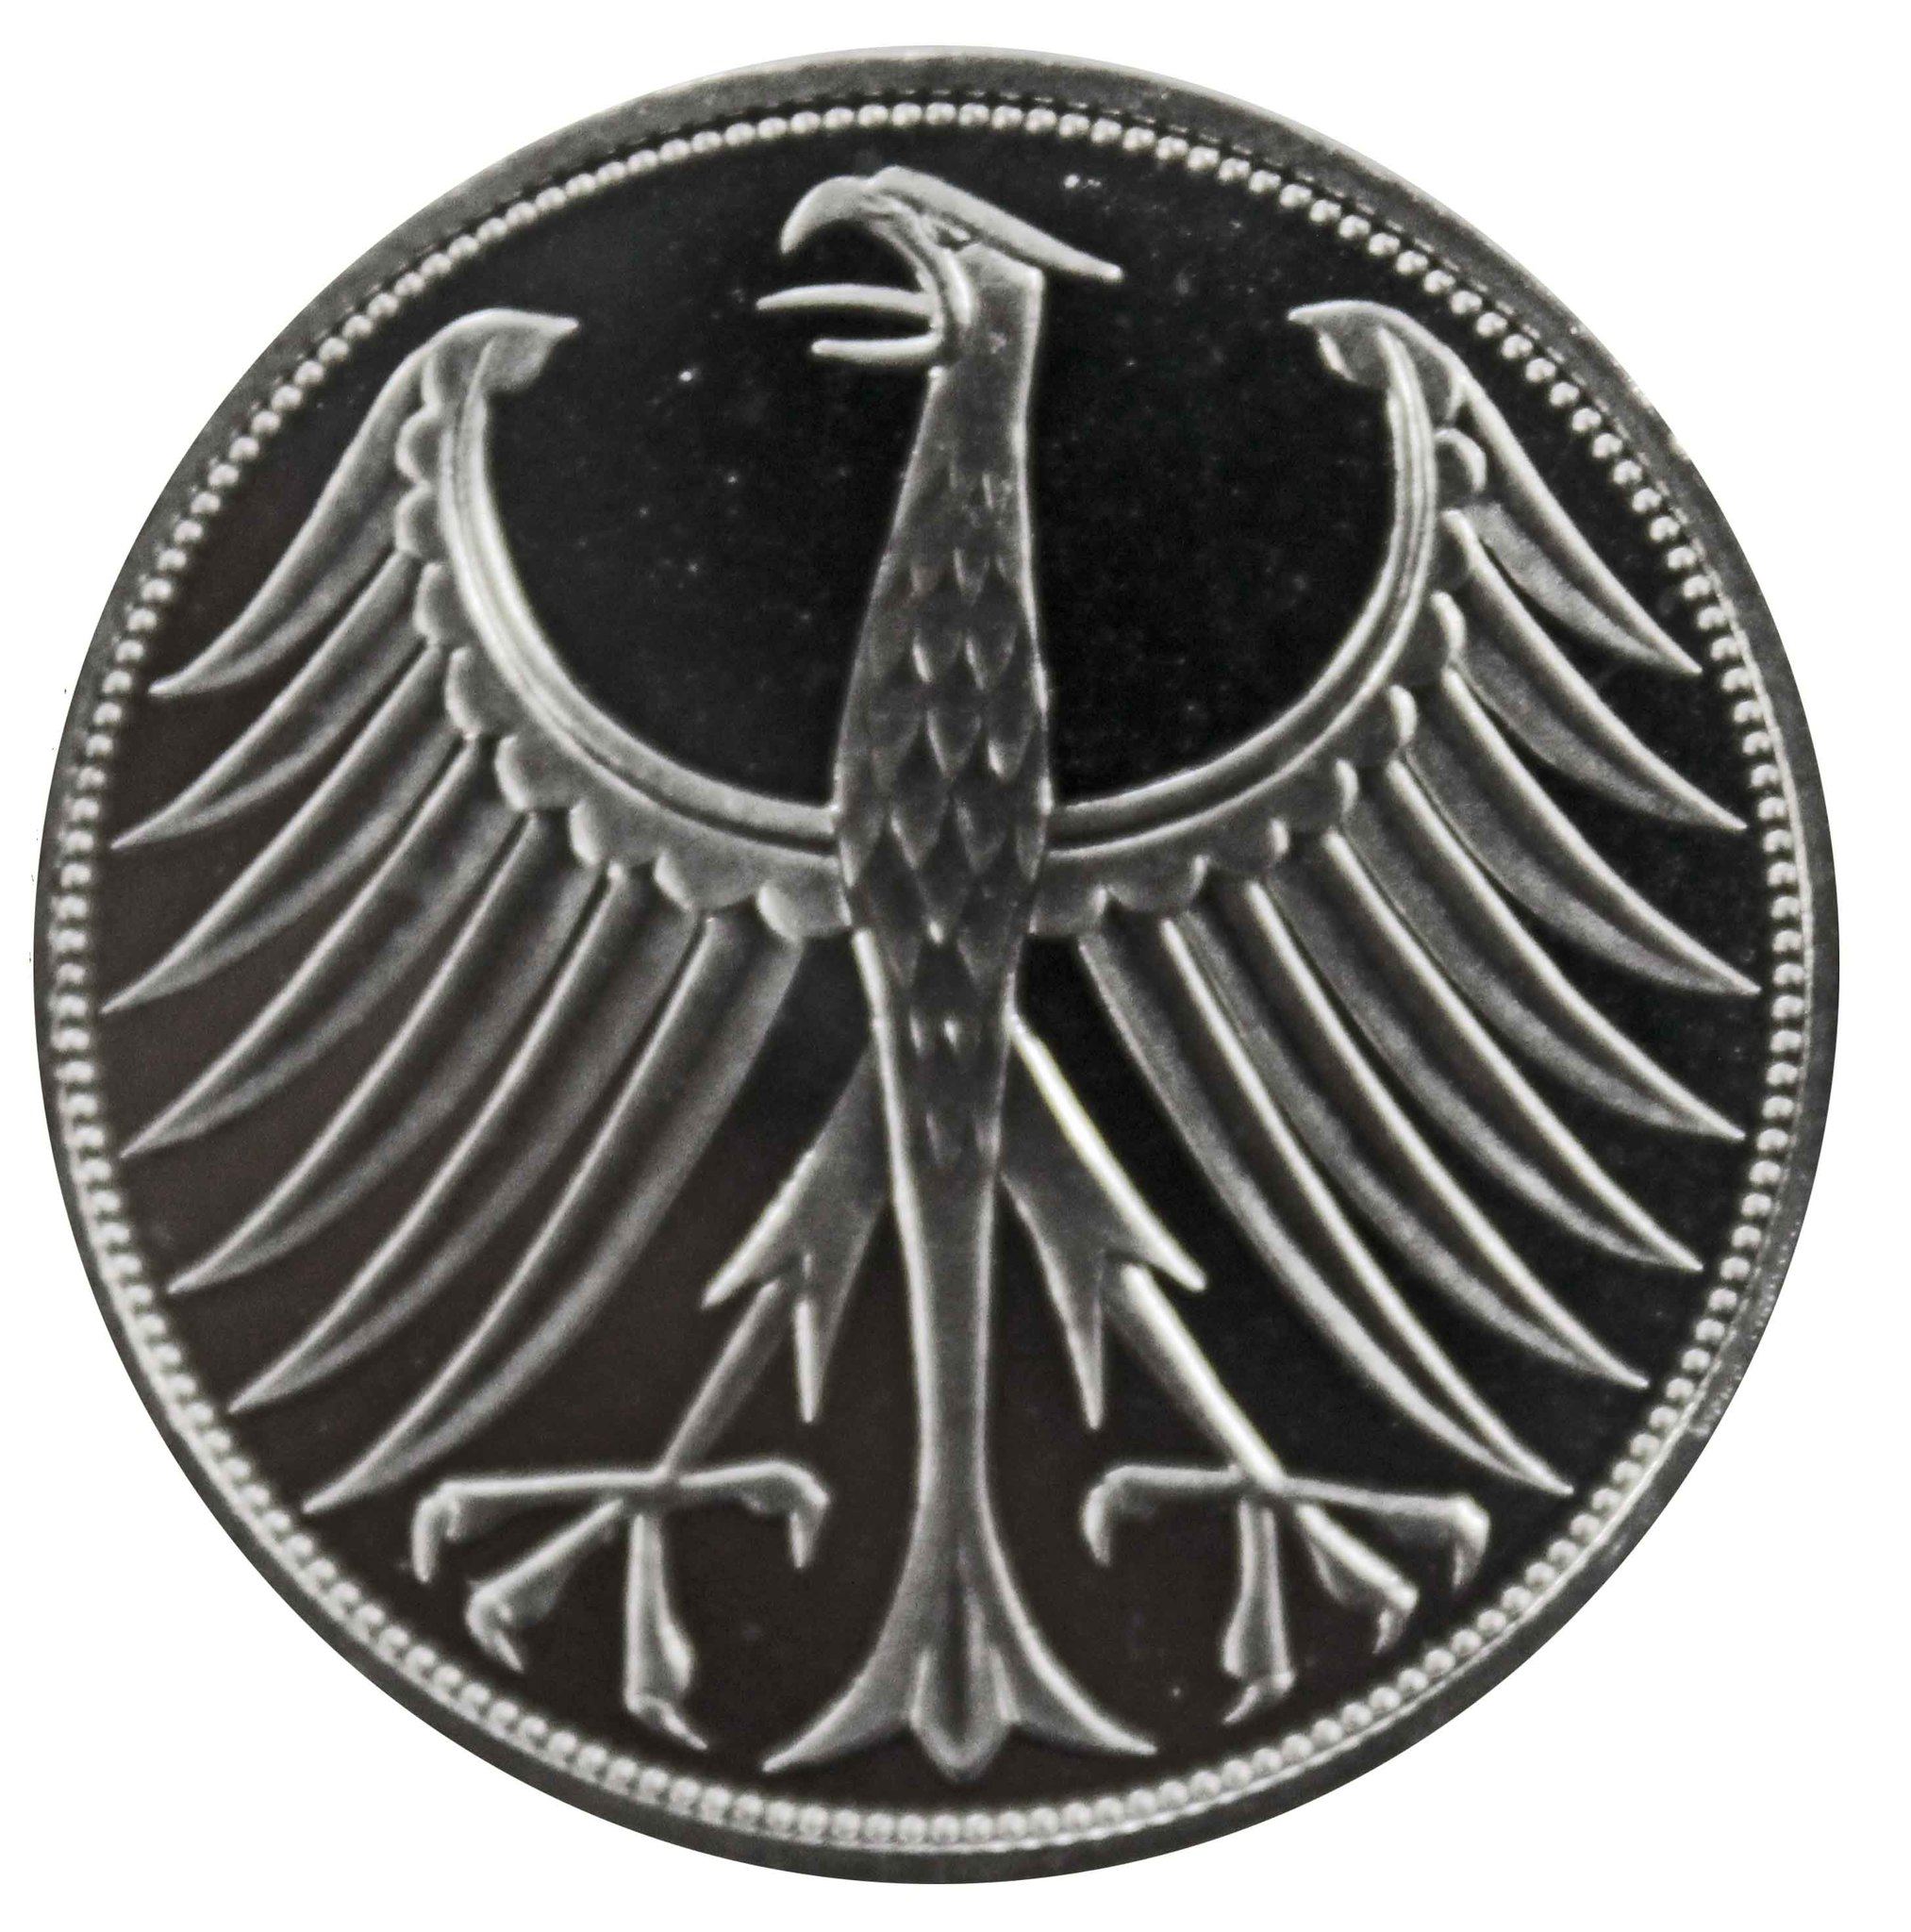 5 марок 1971 (J) Германия. Серебро. PROOF